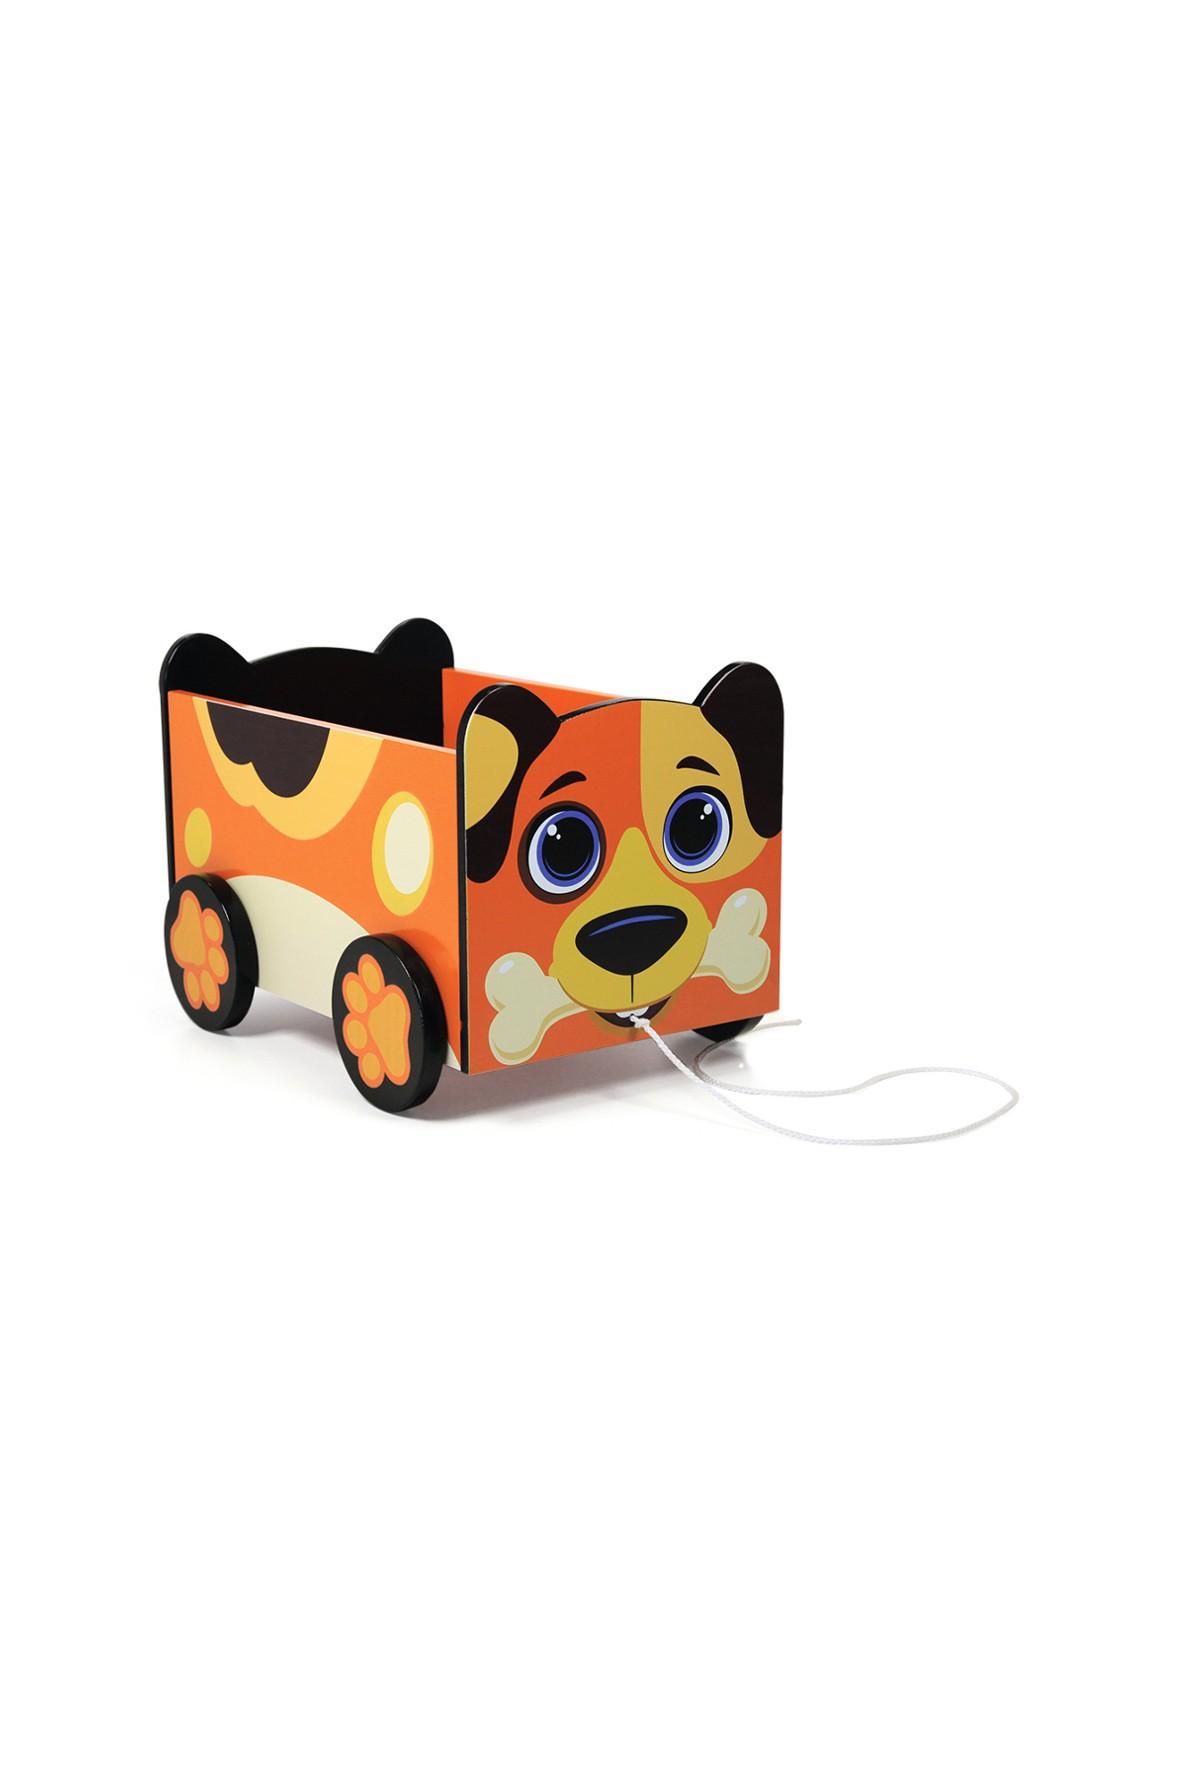 Drewniany wózek na zabawki - Jazda po zabawki!